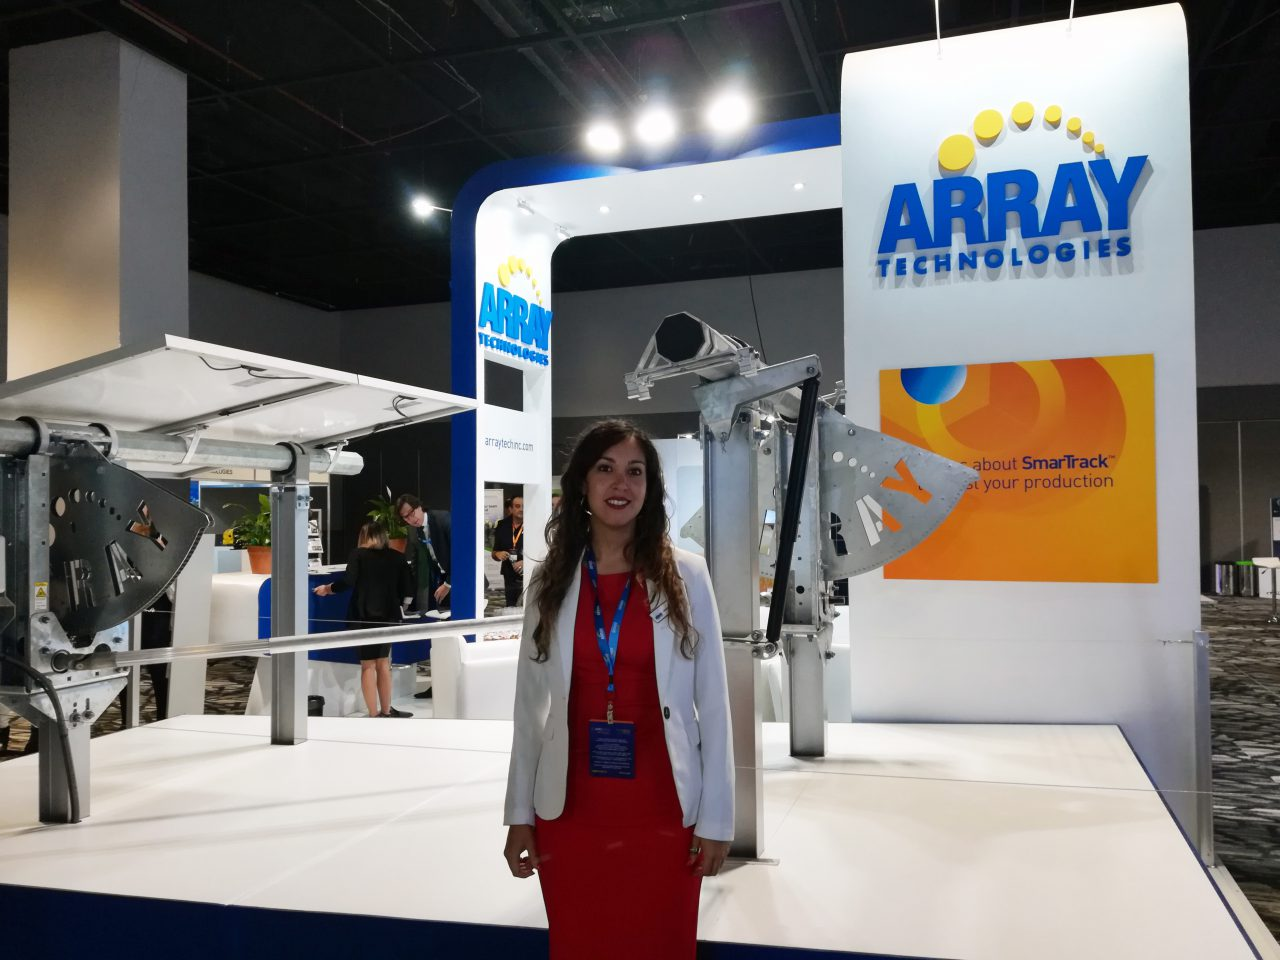 array-1280x960.jpg